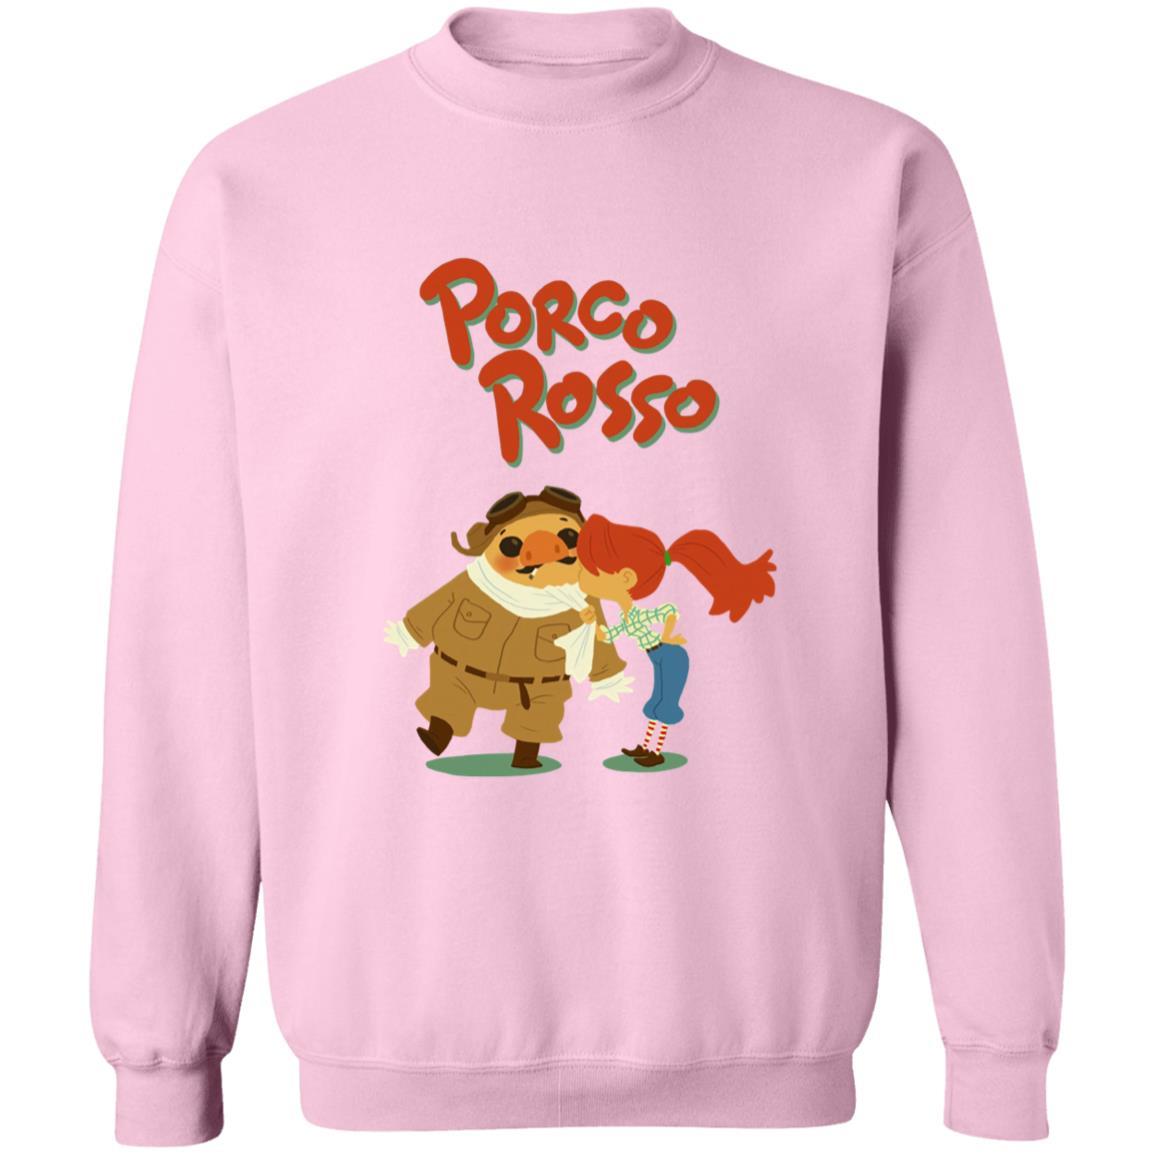 Porco Rosso – The Kiss Sweatshirt